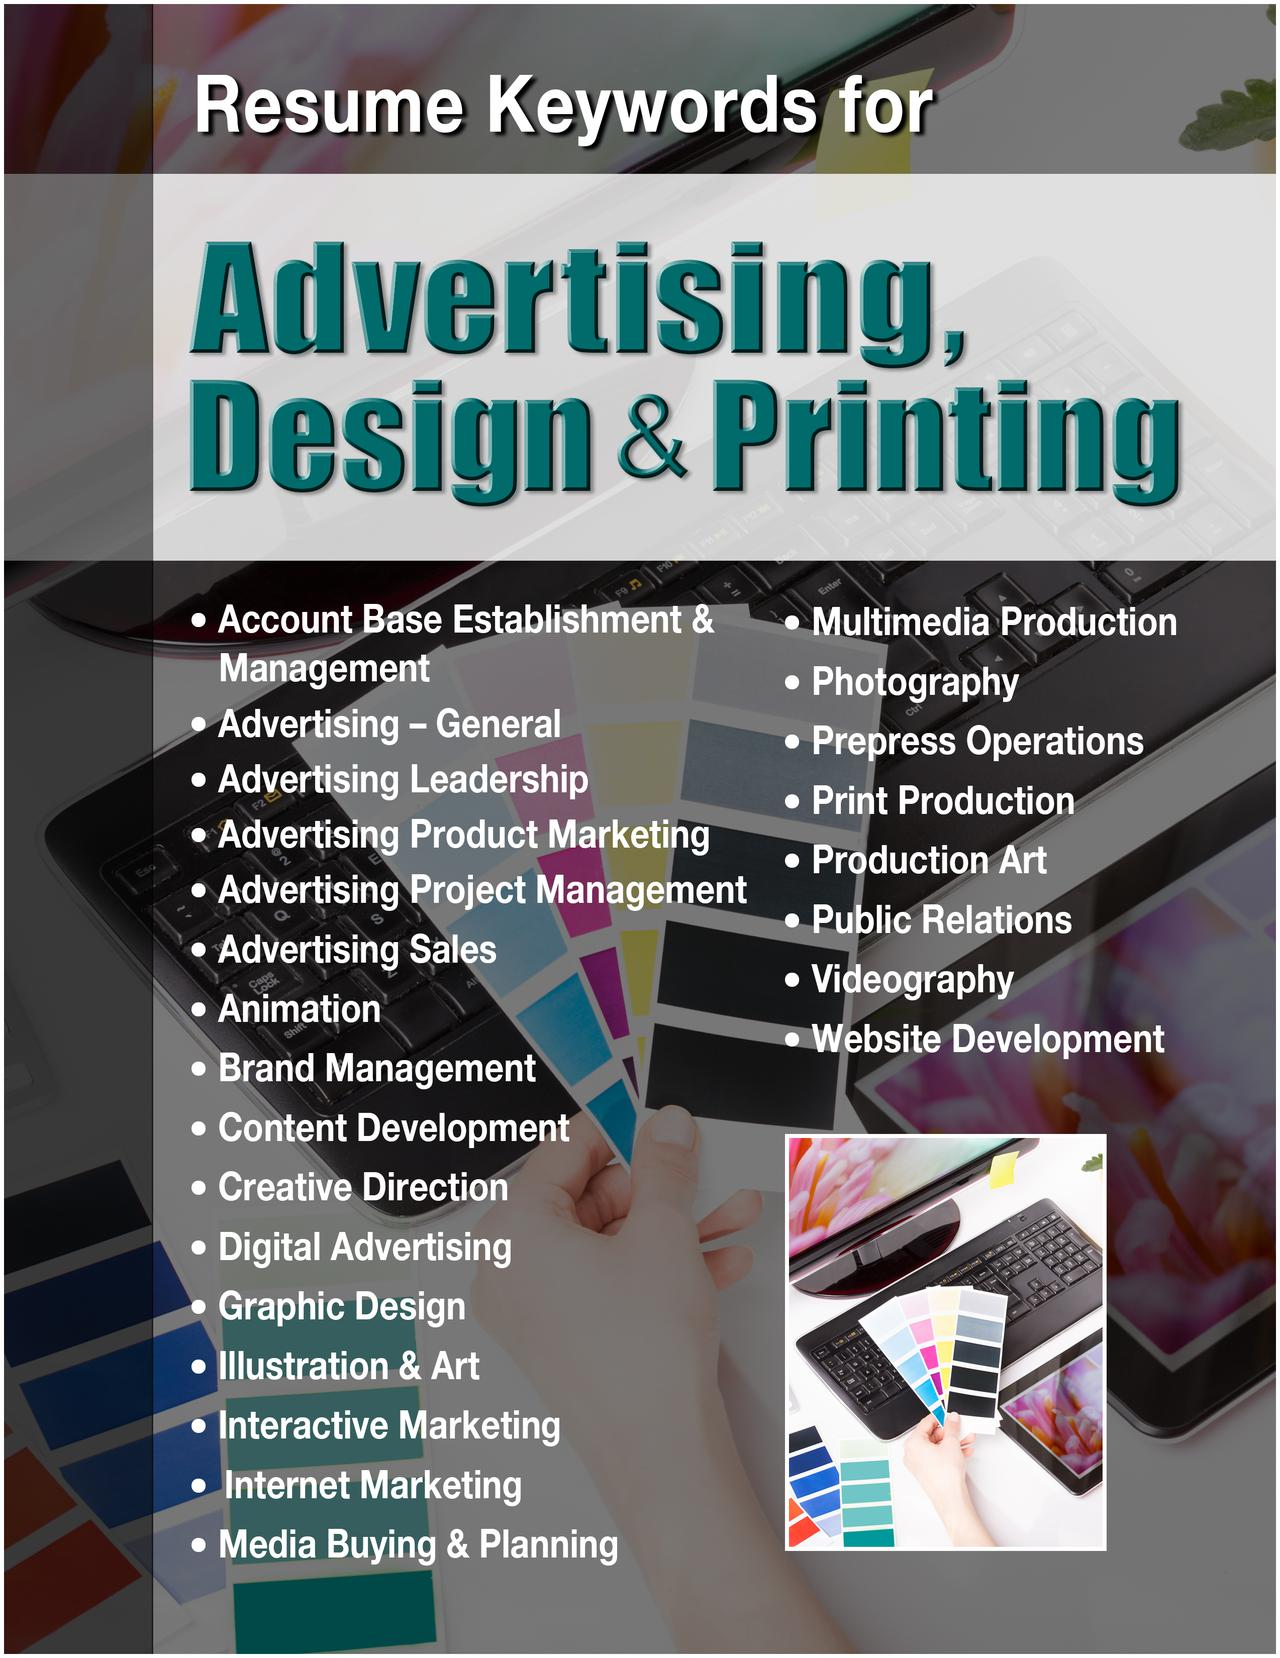 advertising, design & printing divider.jpg